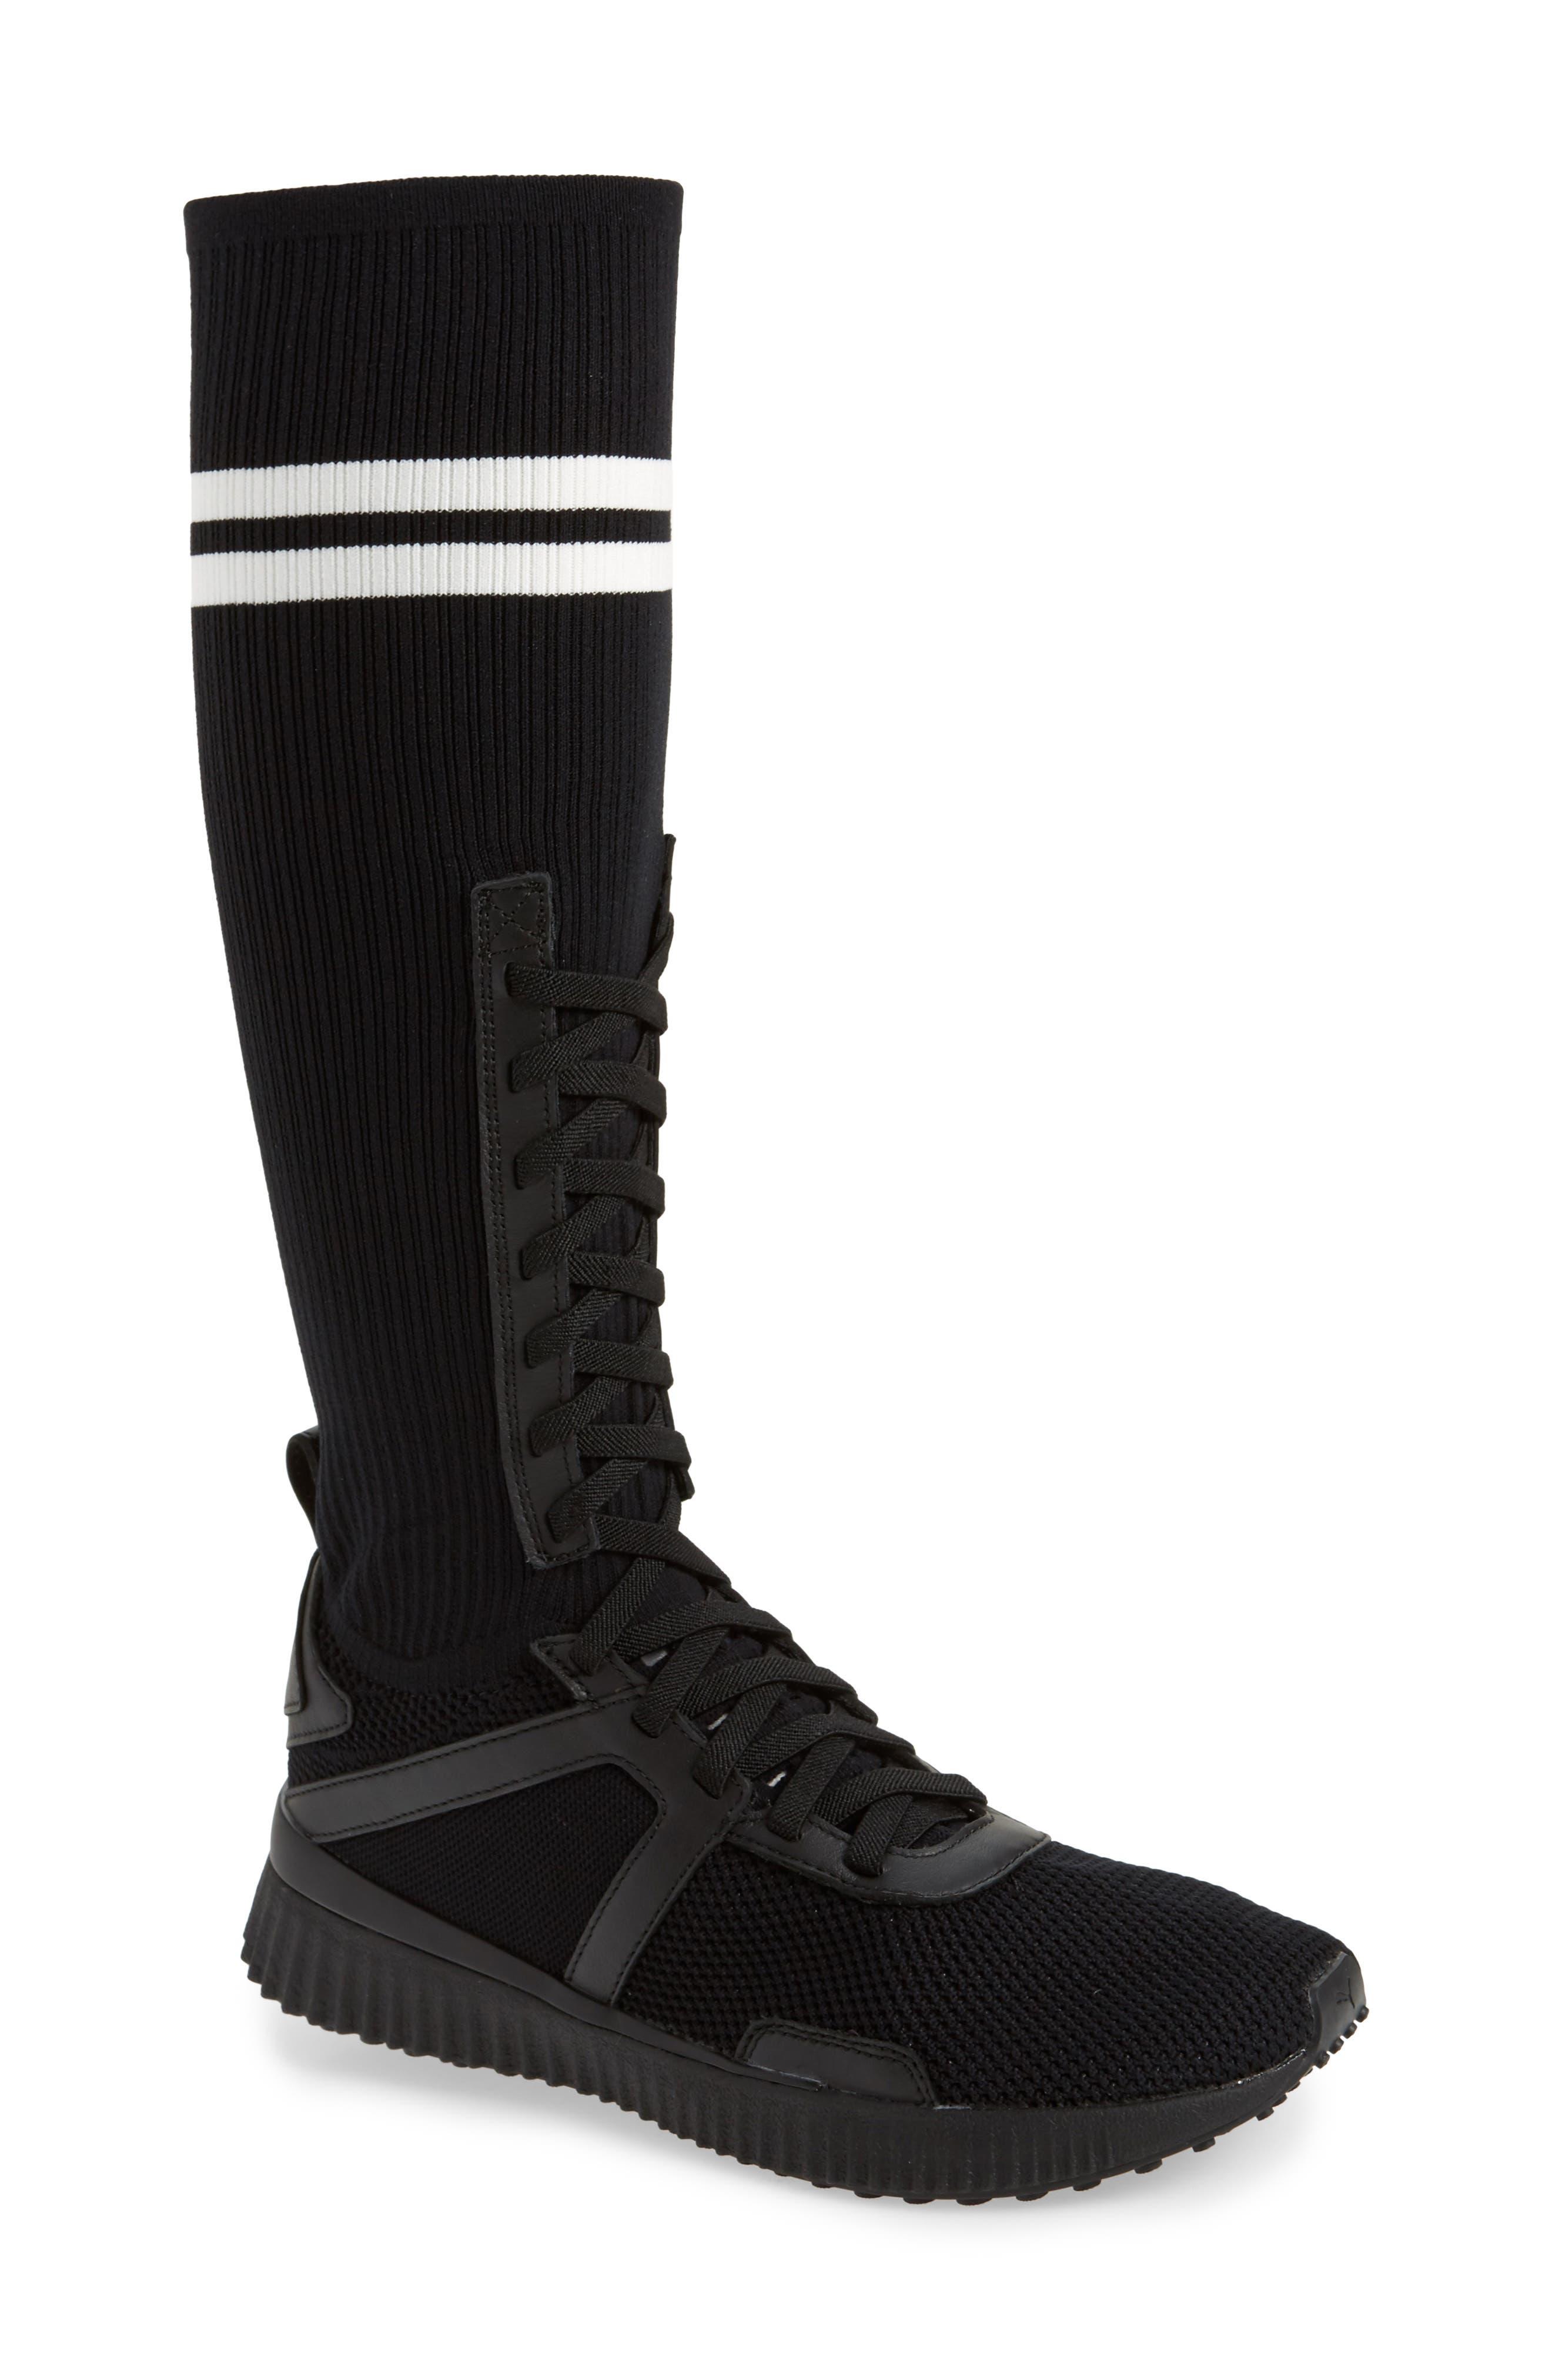 FENTY PUMA by Rihanna Sneaker Boot,                             Main thumbnail 1, color,                             Black/ White